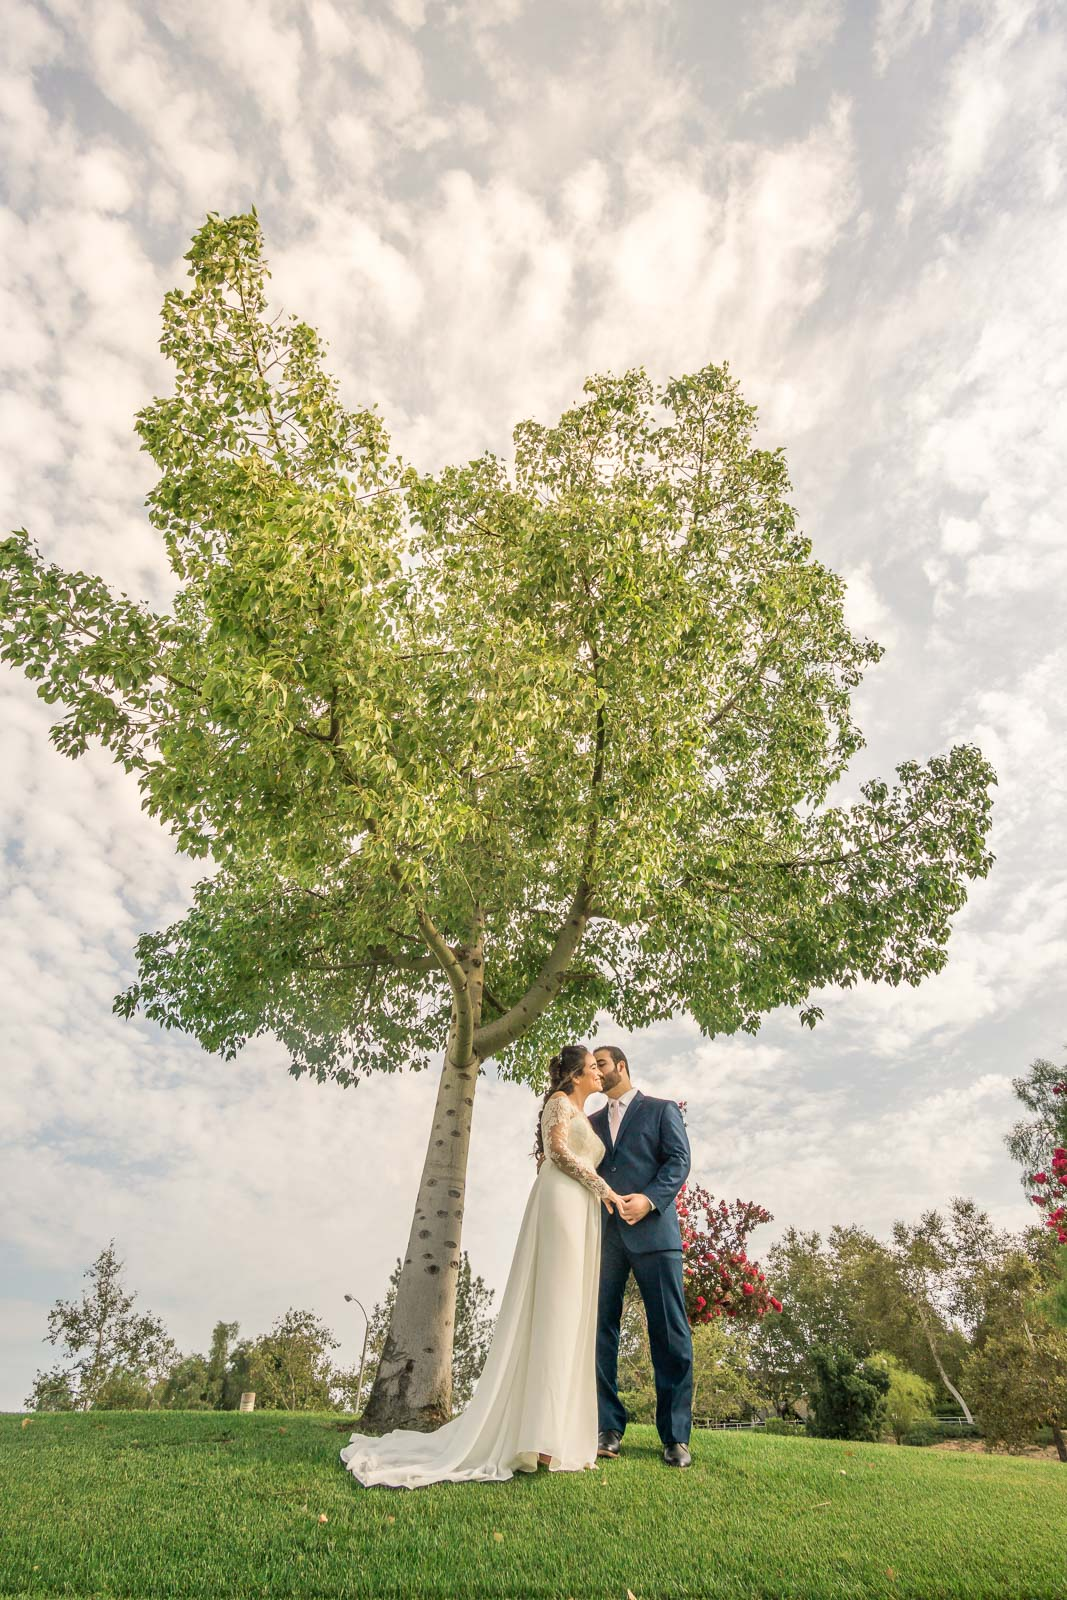 96_Angel-Brea-Orange-County_Joseph-Barber-Wedding-Photography.jpg